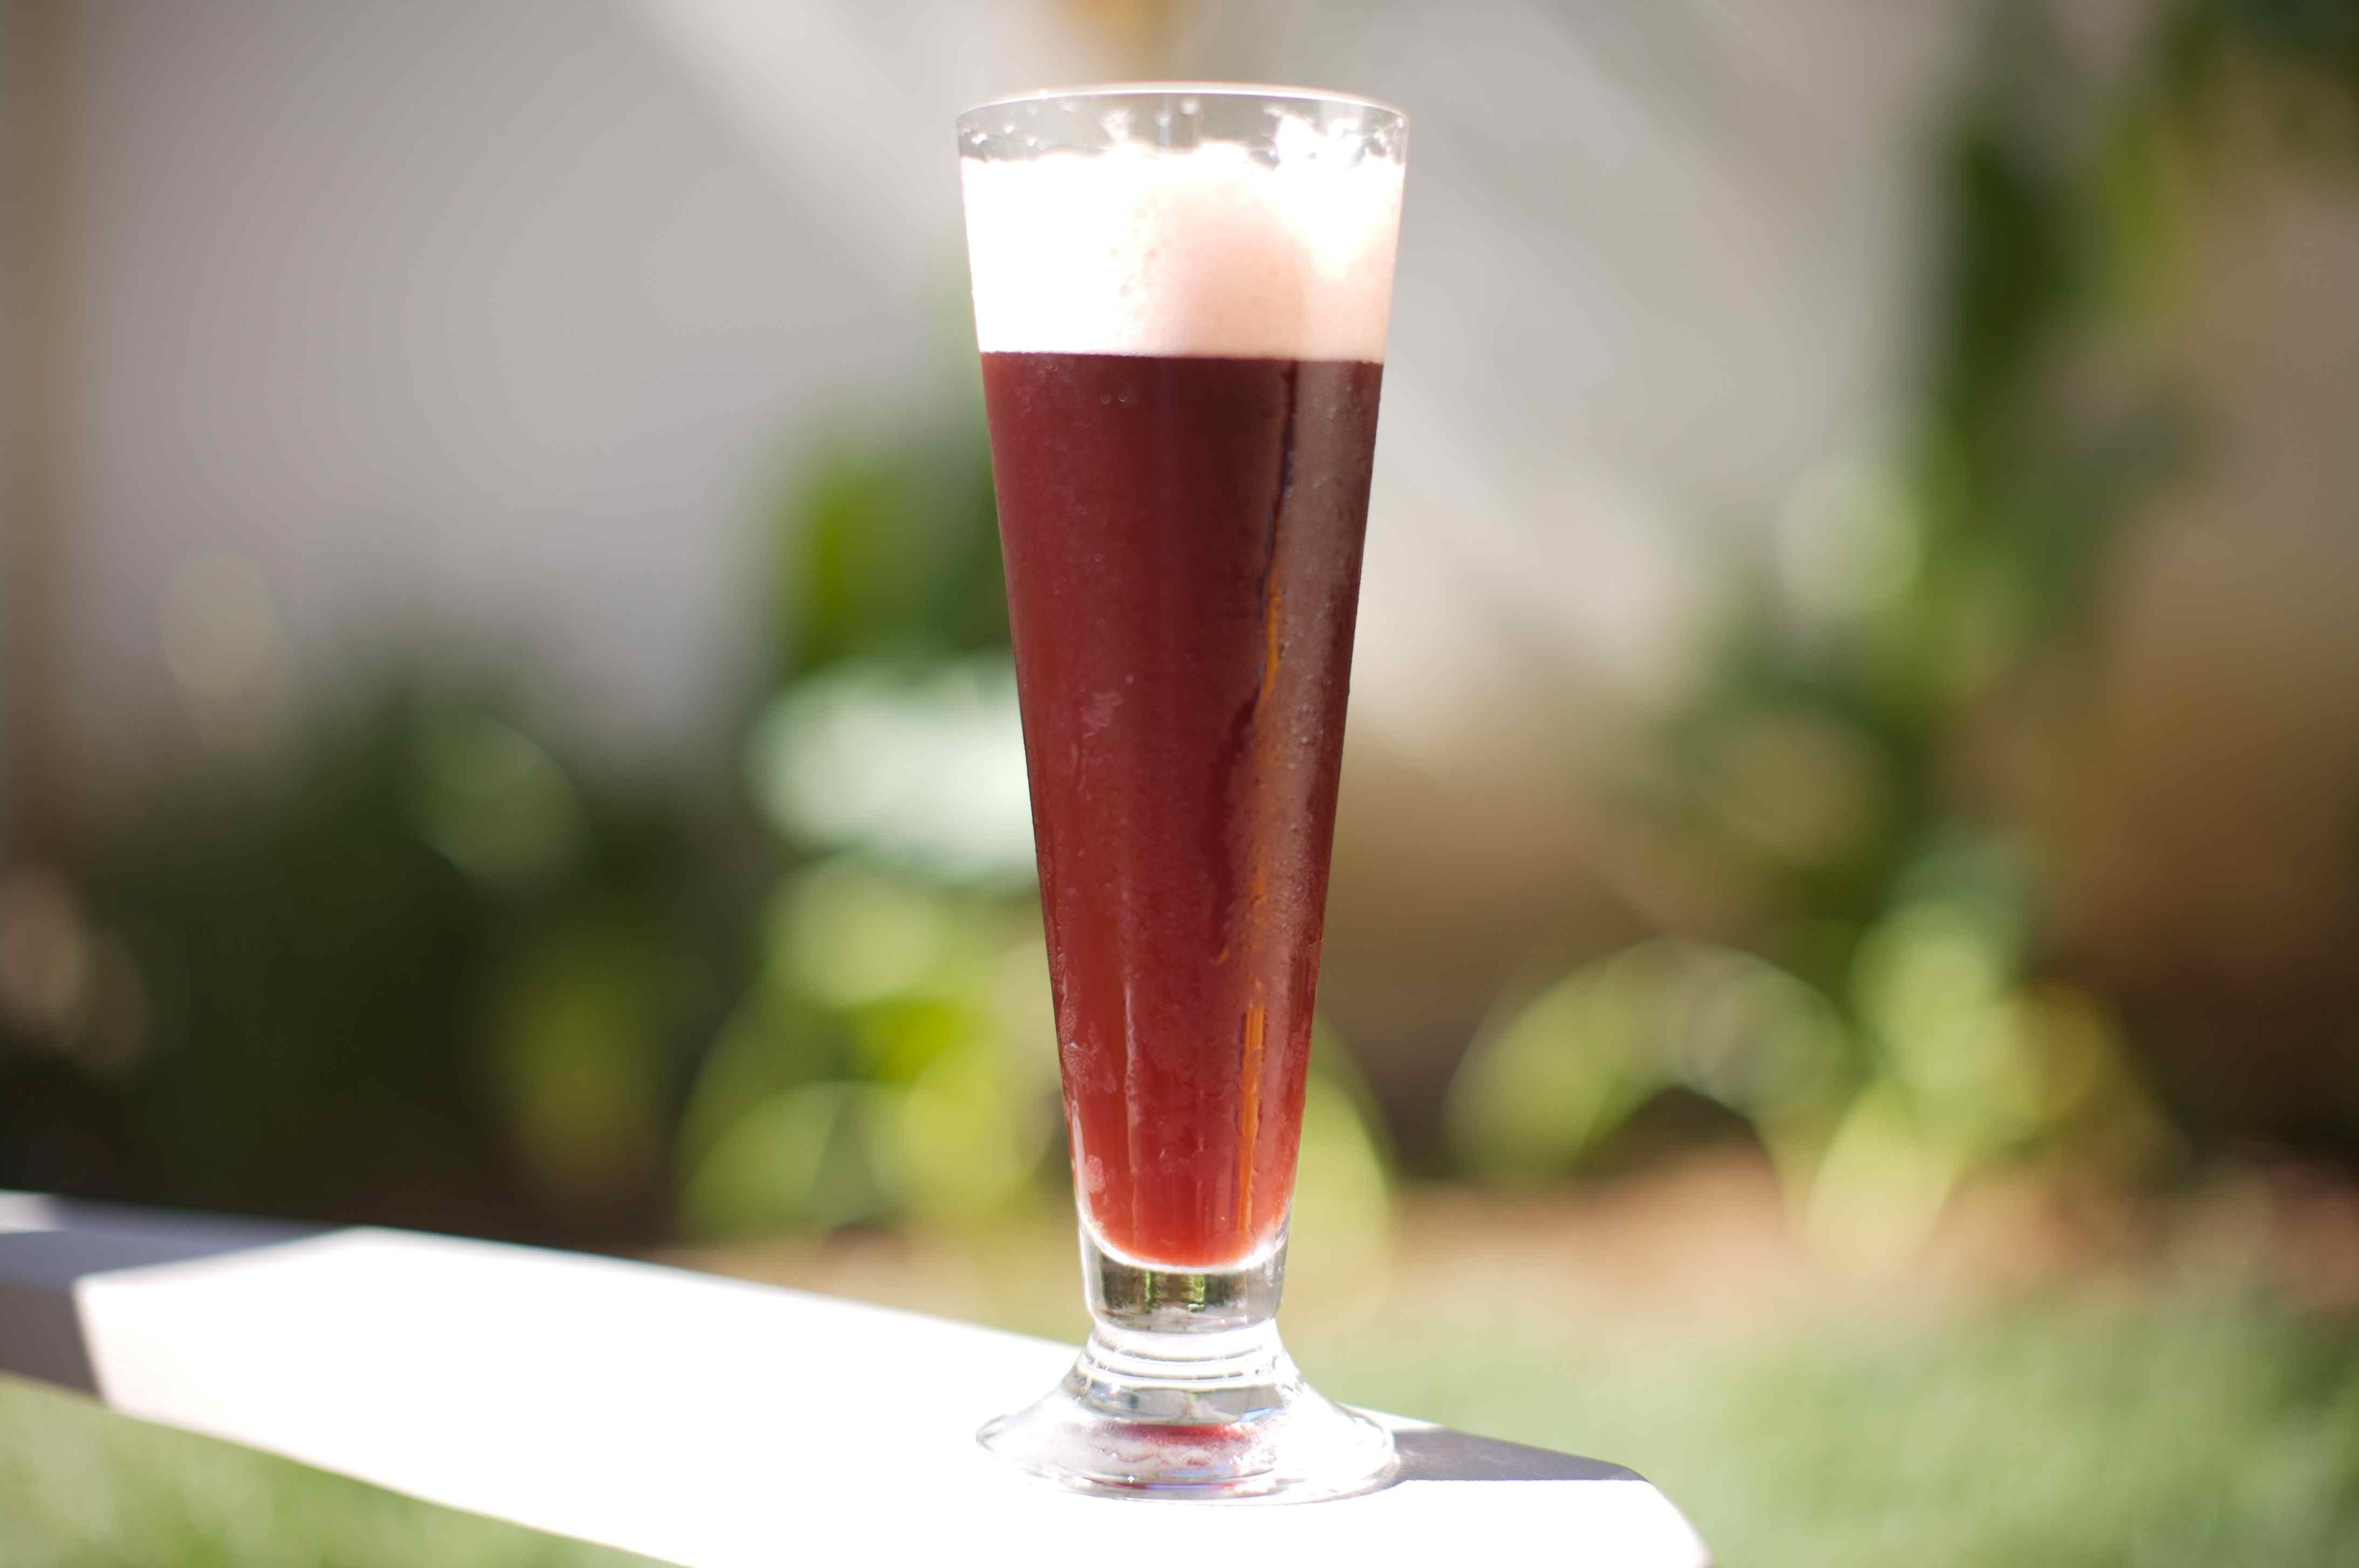 Raspberry Snakebite - Vanilla Porter, Hard Cider, and Fresh Raspberry Beertail